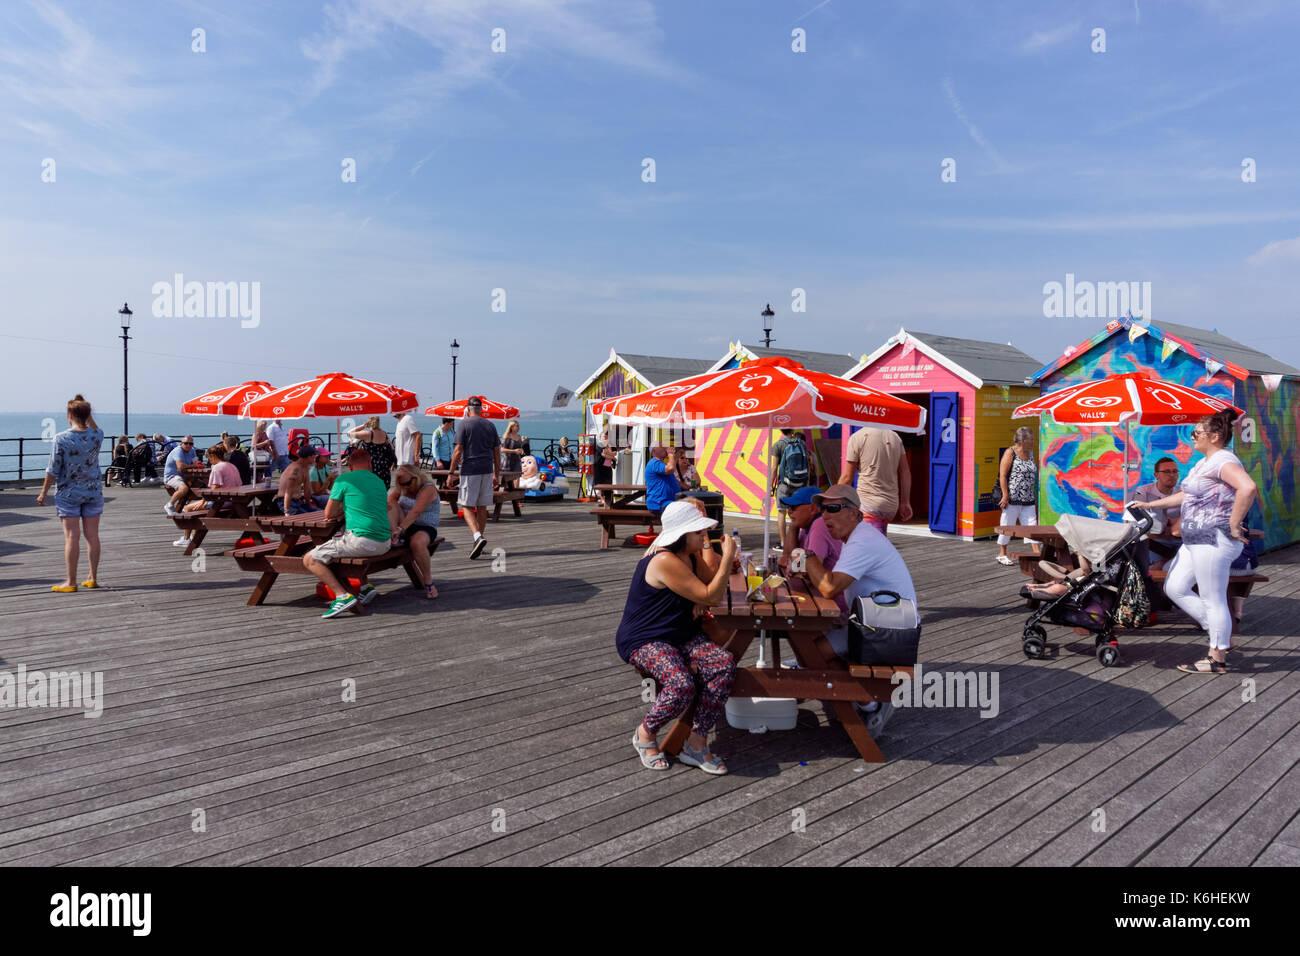 People enjoy sunny day on the Southend Pier, Southend-on-Sea, Essex, England, United Kingdom, UK - Stock Image